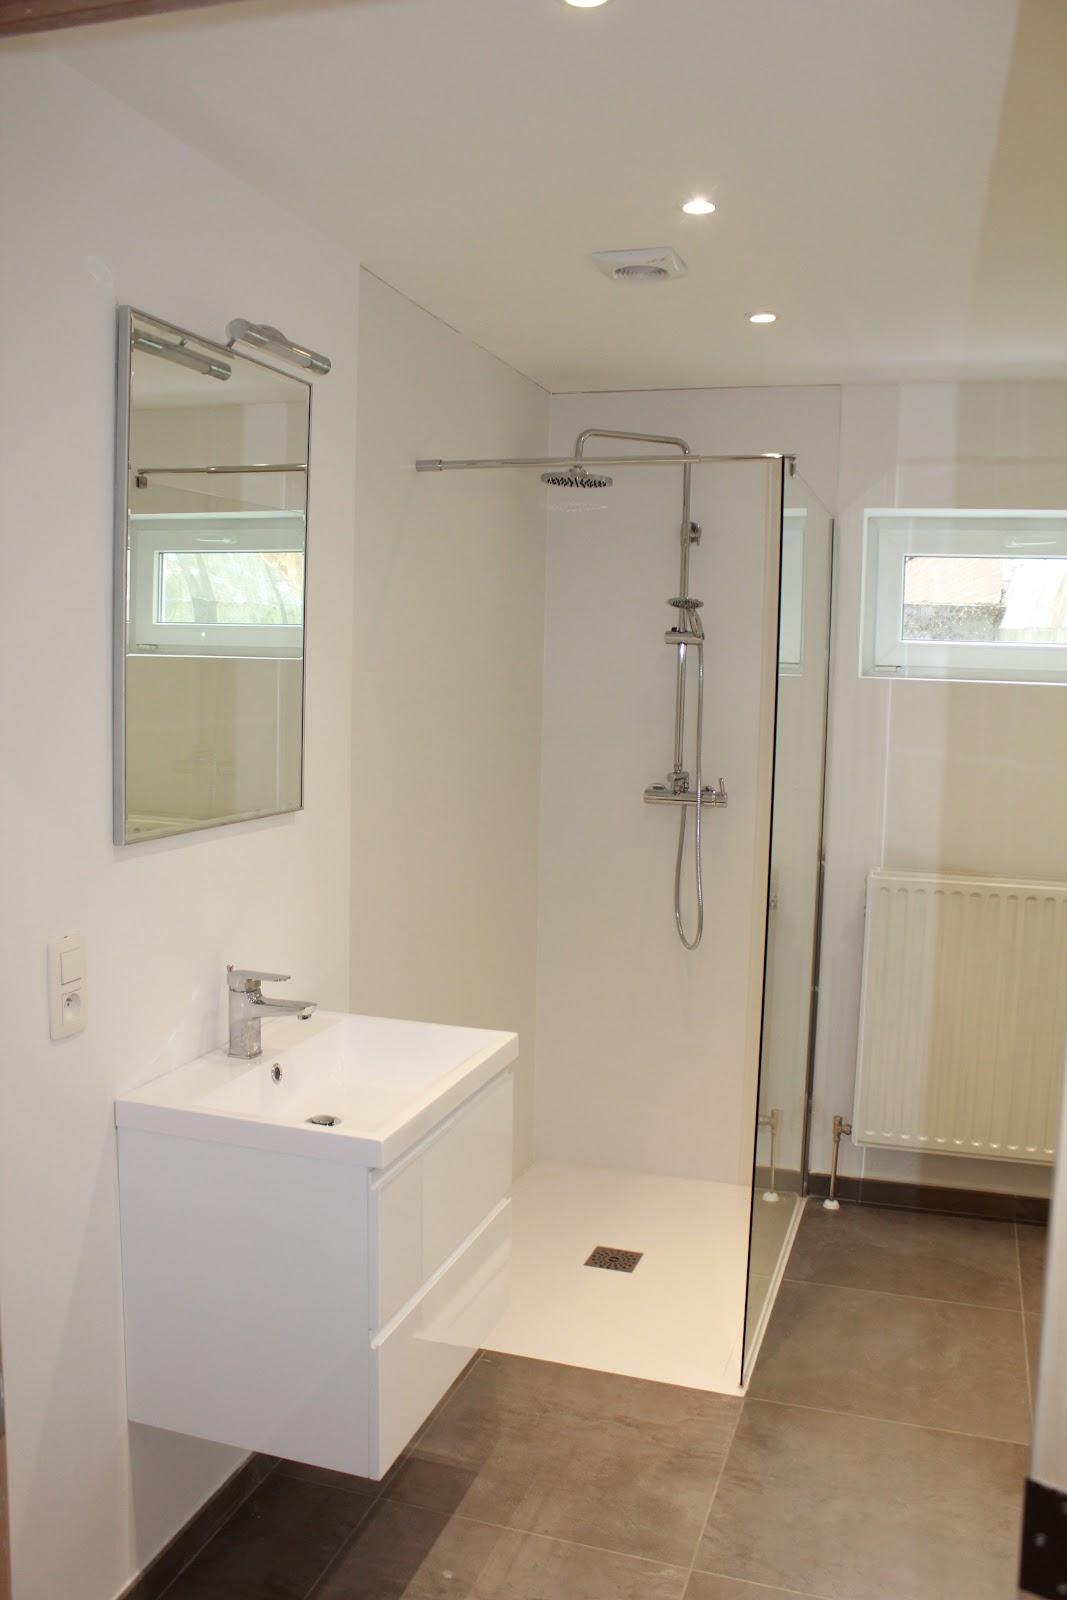 salle de bain rénovée - colocation